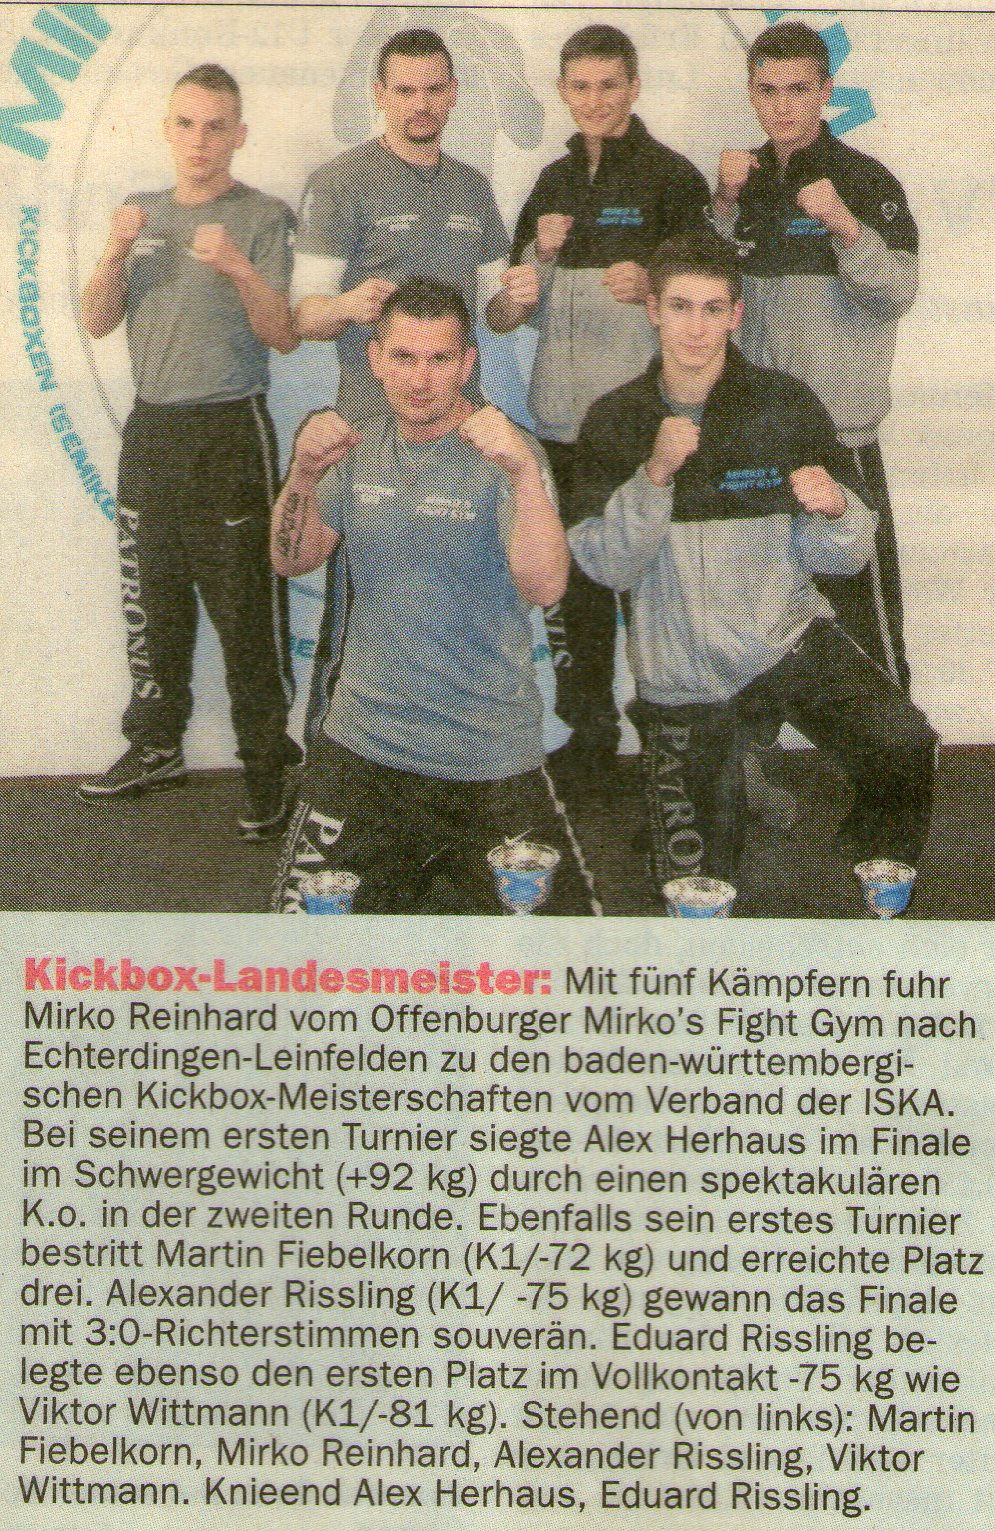 Kickbox-Landesmeisterschaft ISKA